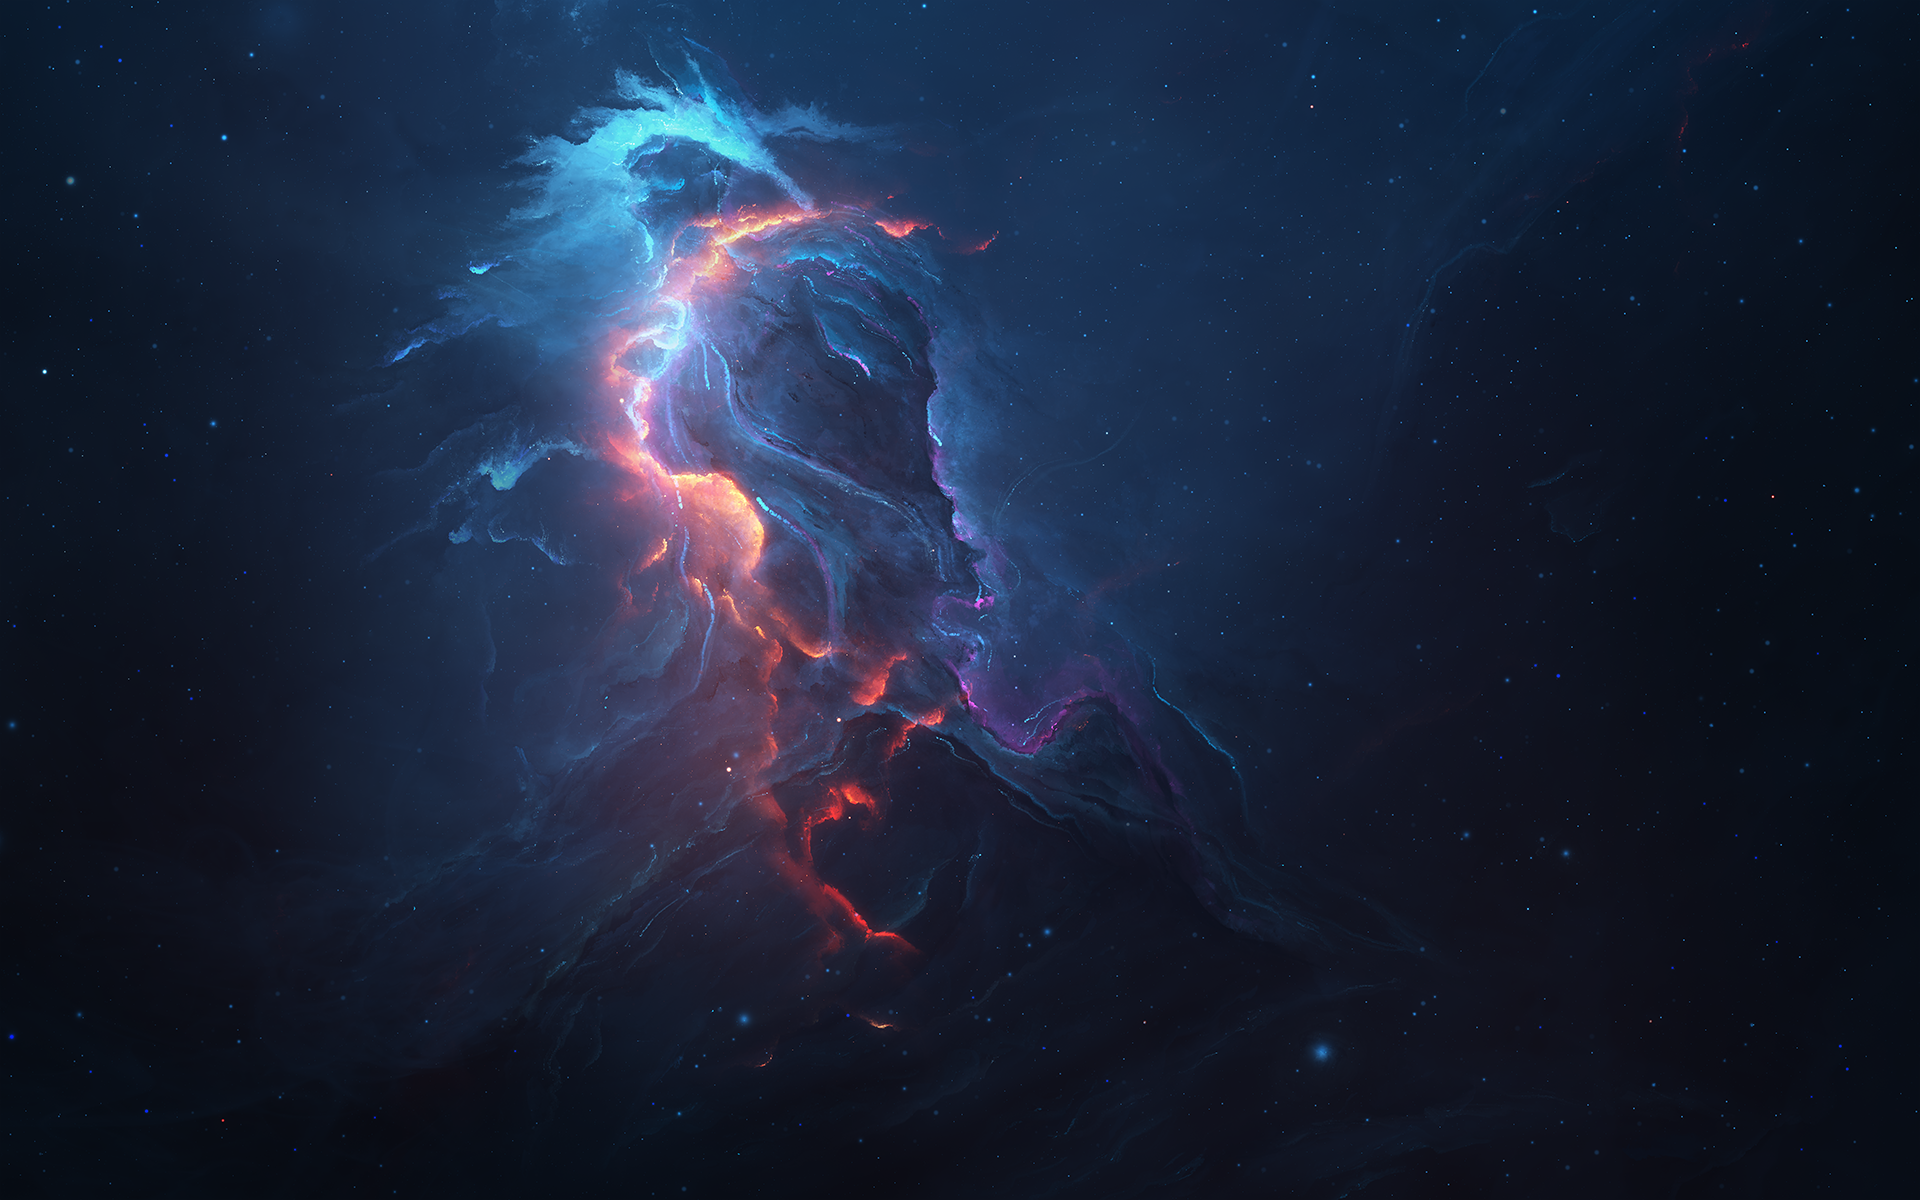 Atlantis on Fire HD Wallpaper | Background Image ...